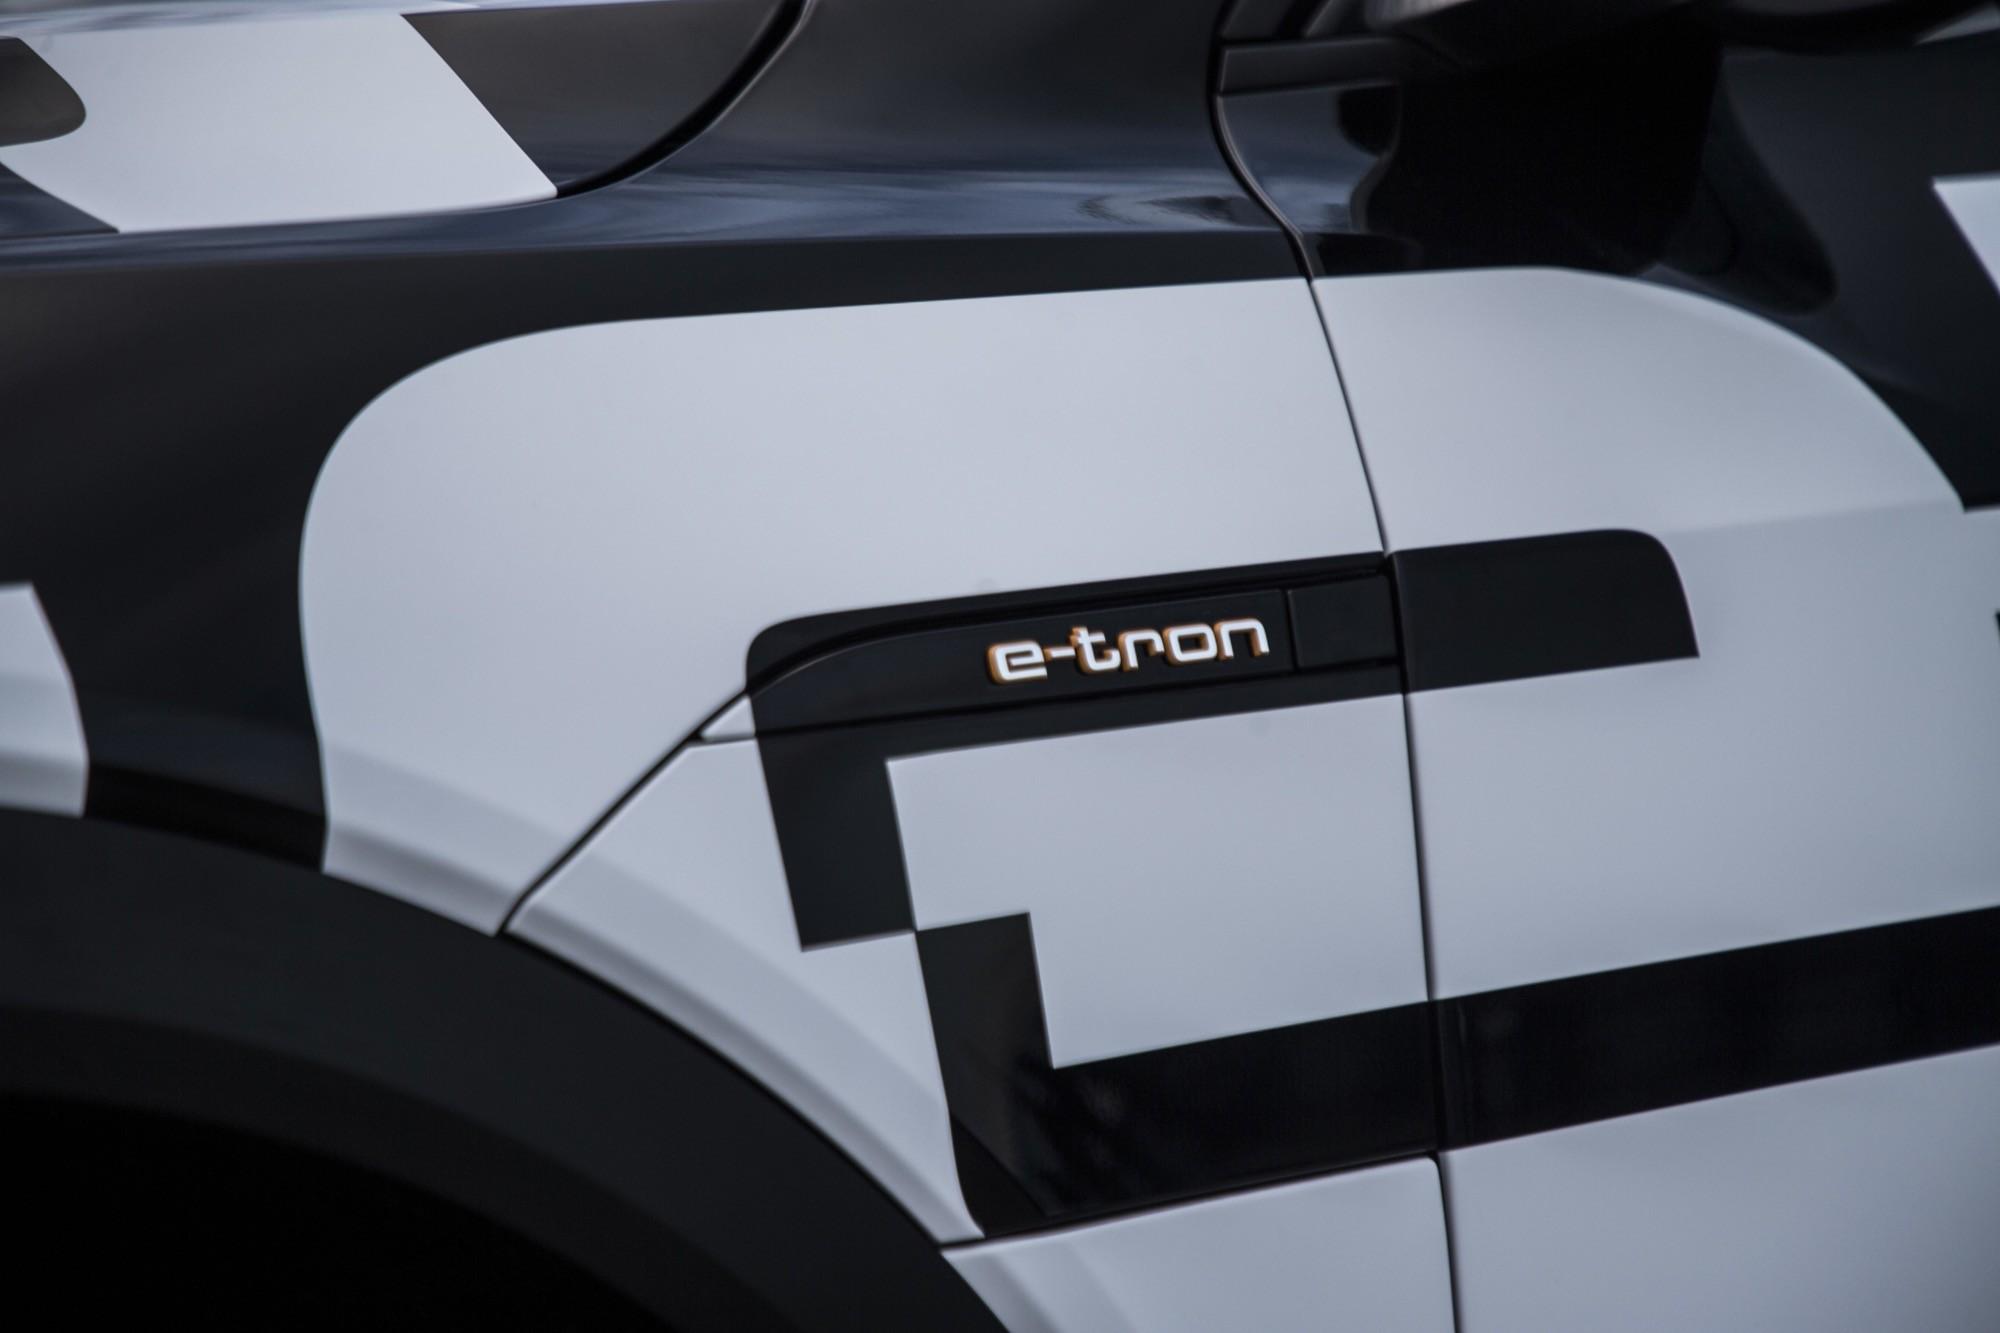 Audi E-Tron: Audi zeigt Prototyp seines ersten Elektroautos - Audi E-Tron-Prototyp (Bild: Audi)